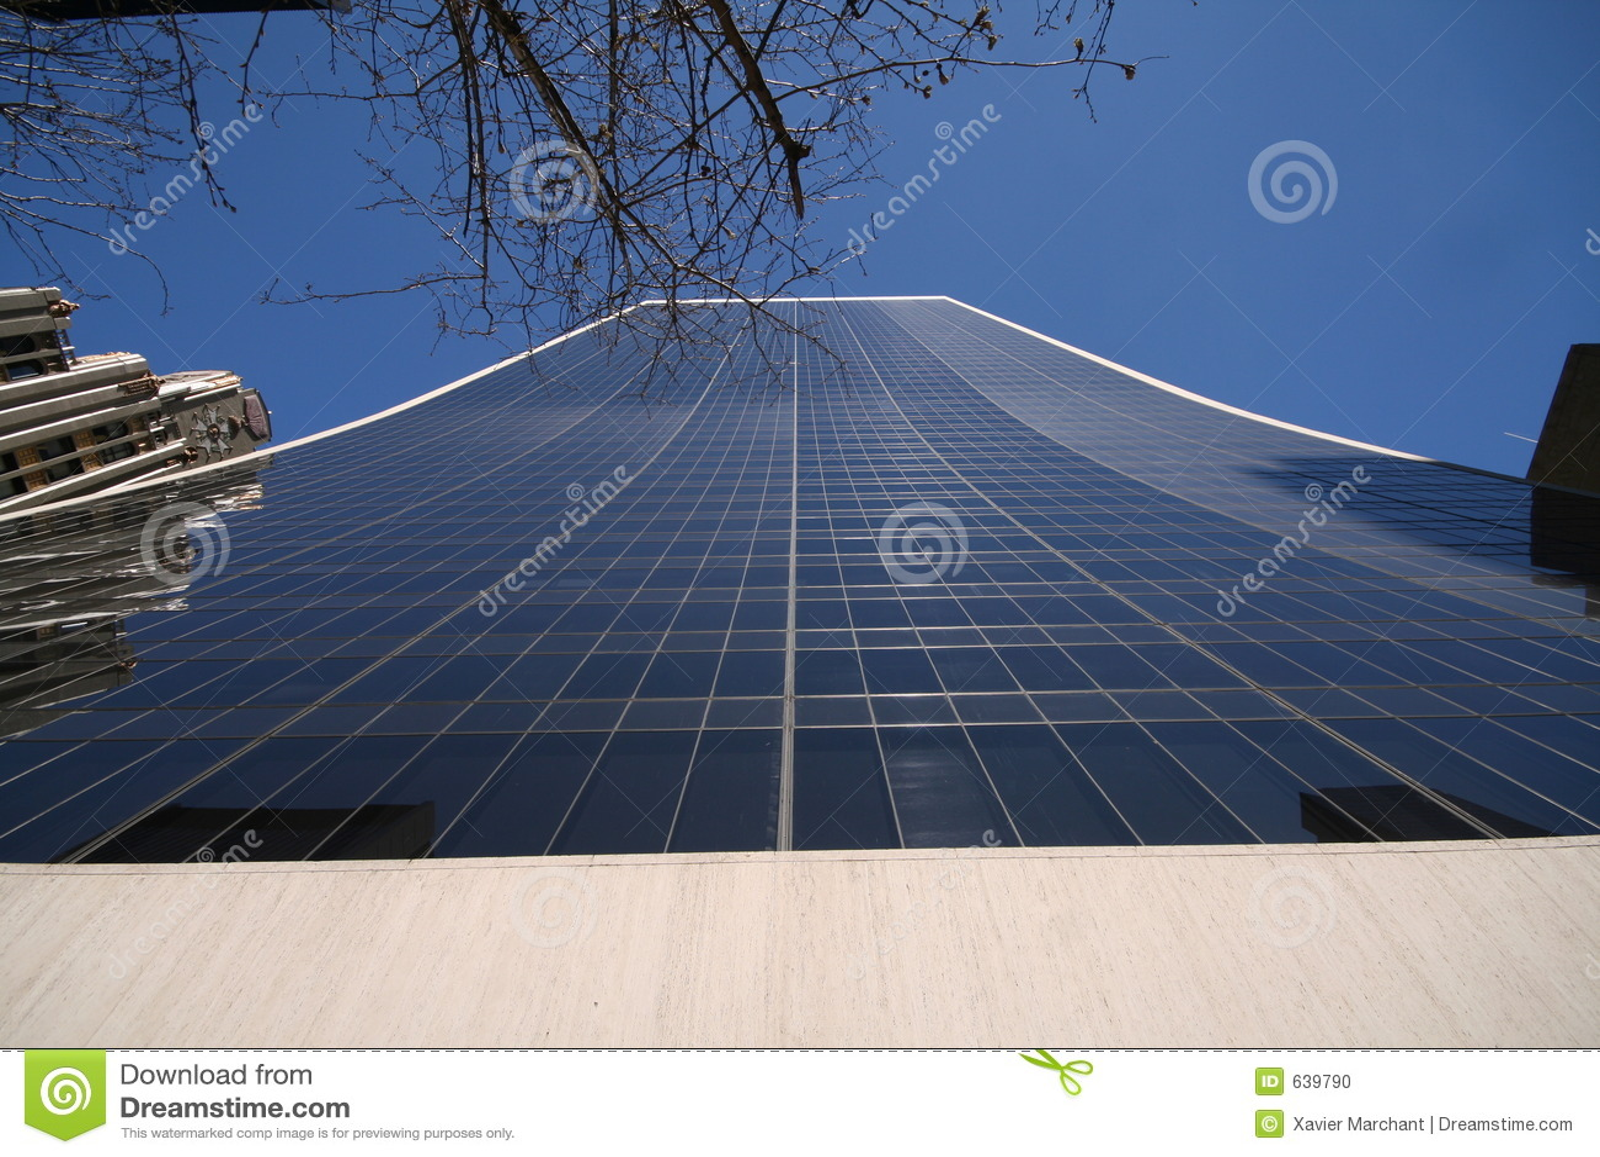 Edifício de vidro alto